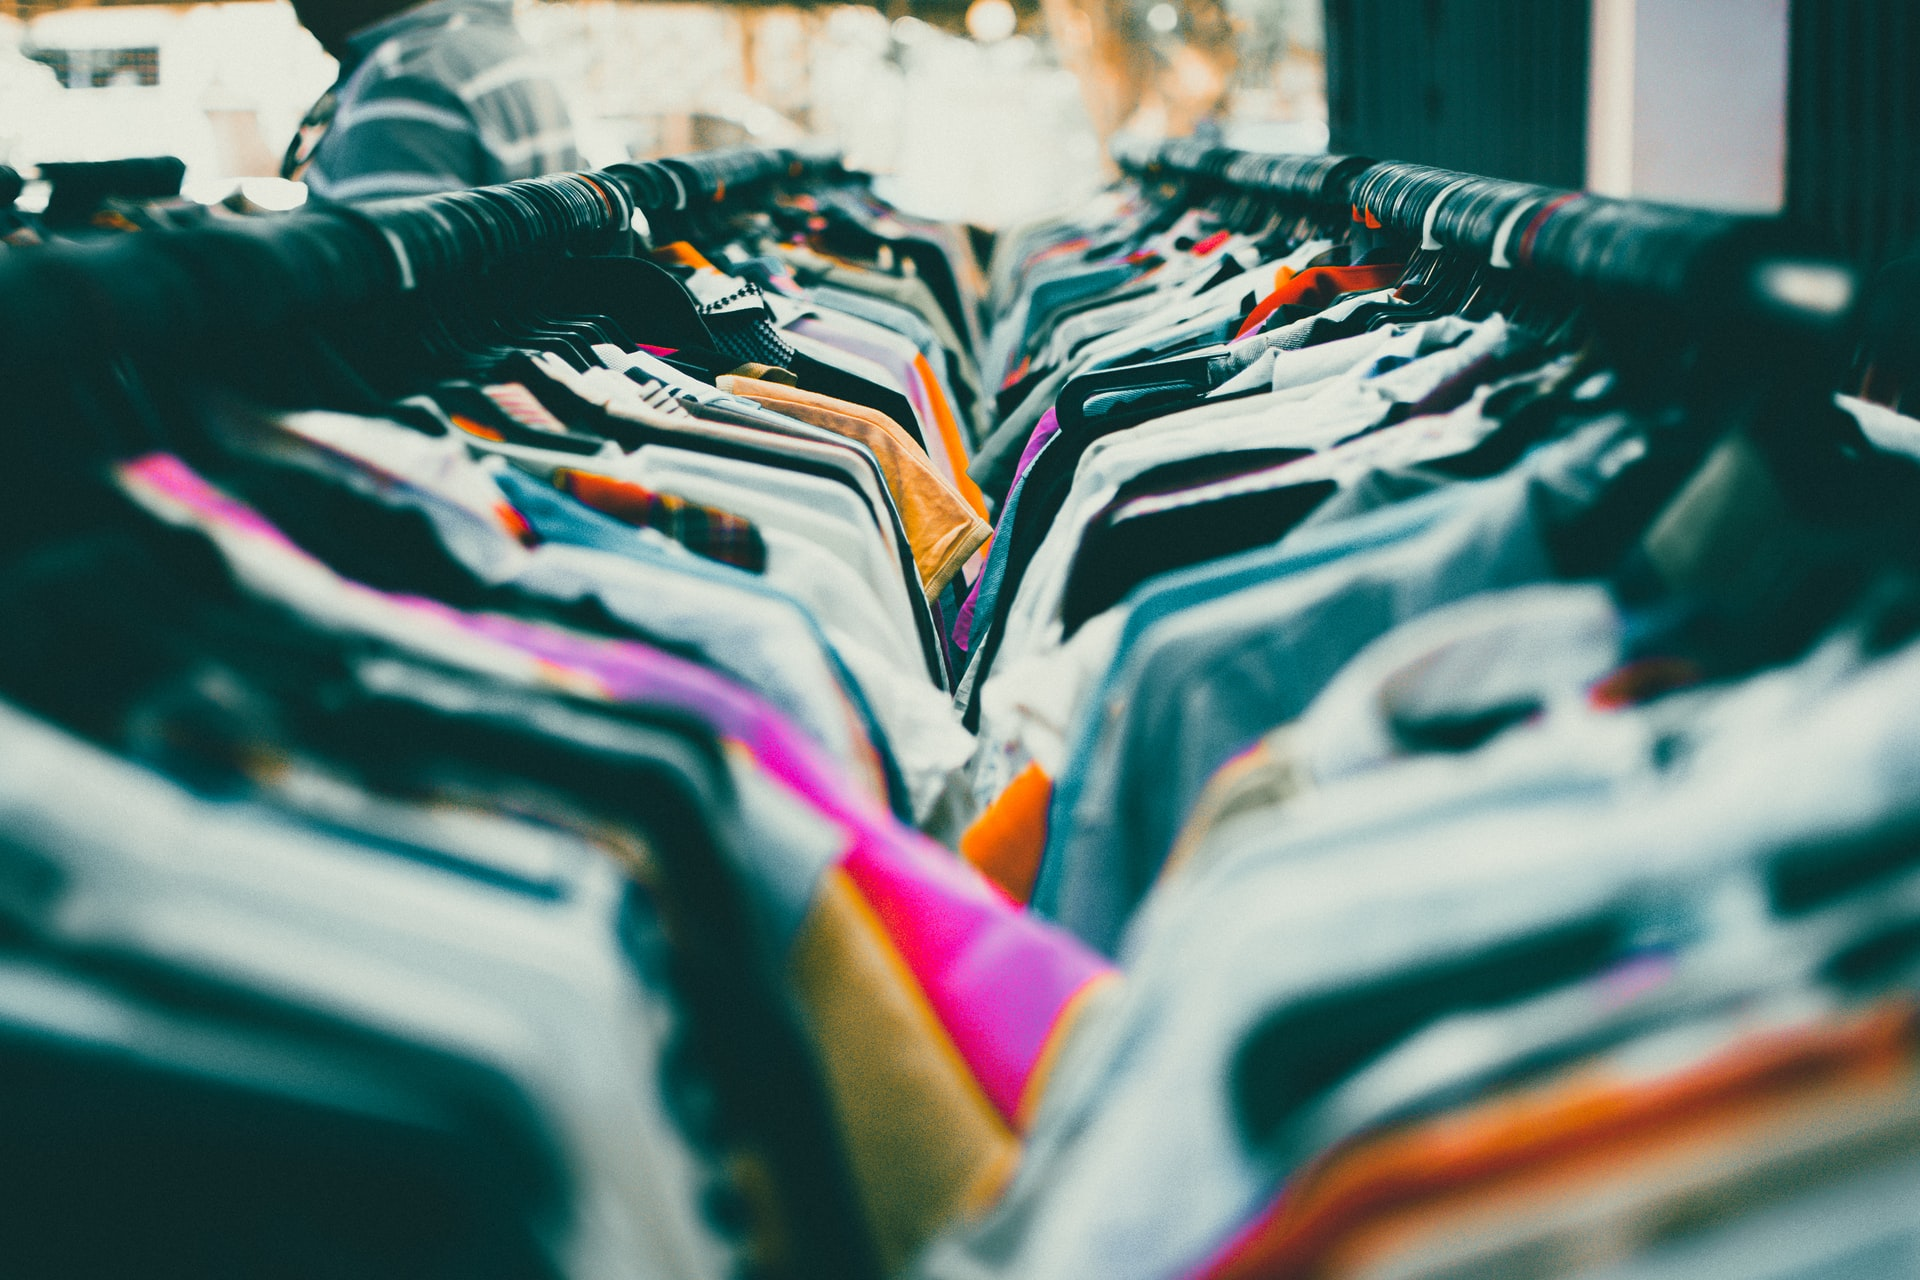 haine asezate pe umerase intr-un magazin